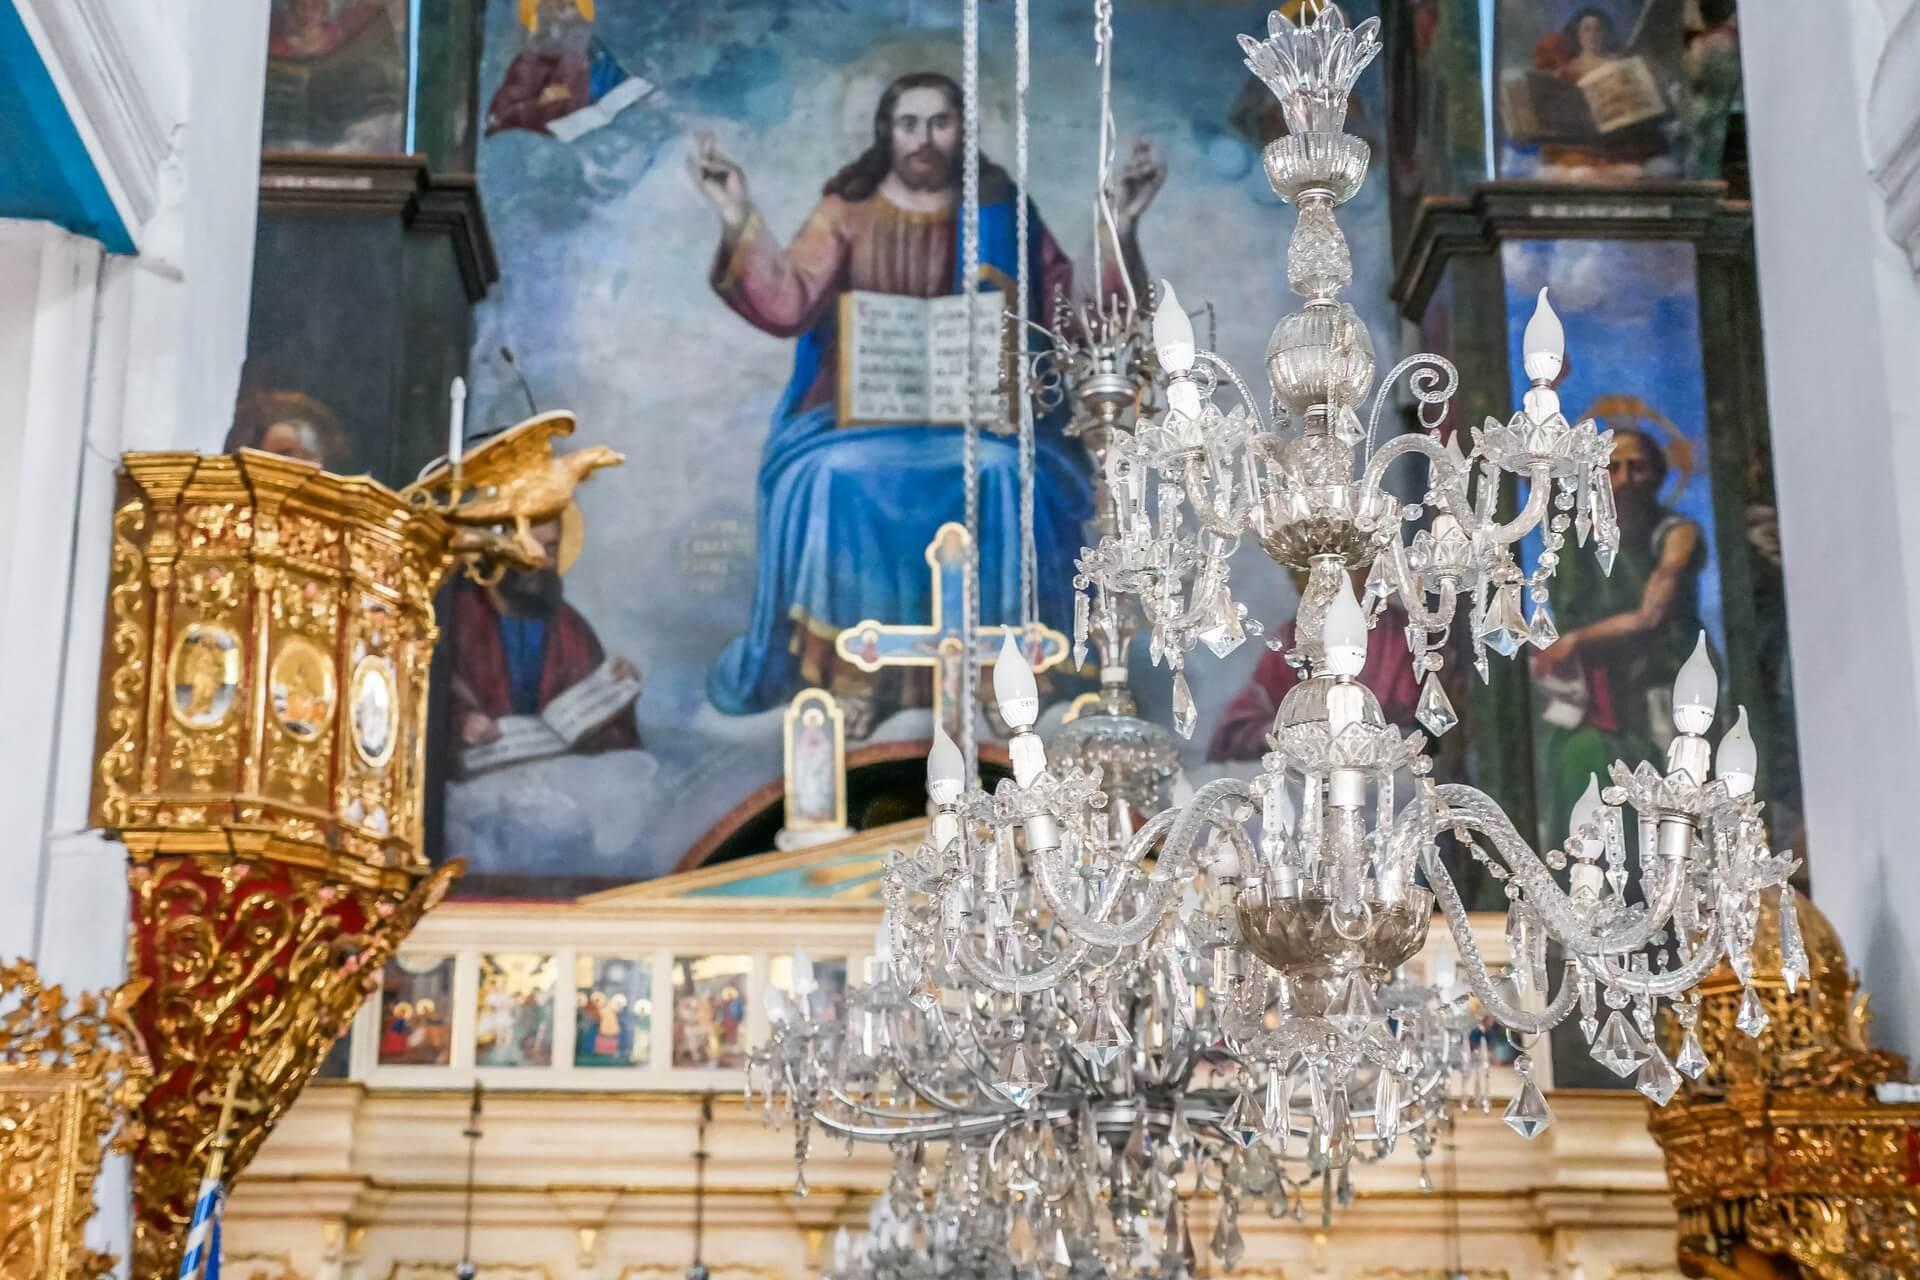 Metropolitan Church Chania Crete - allincrete.com